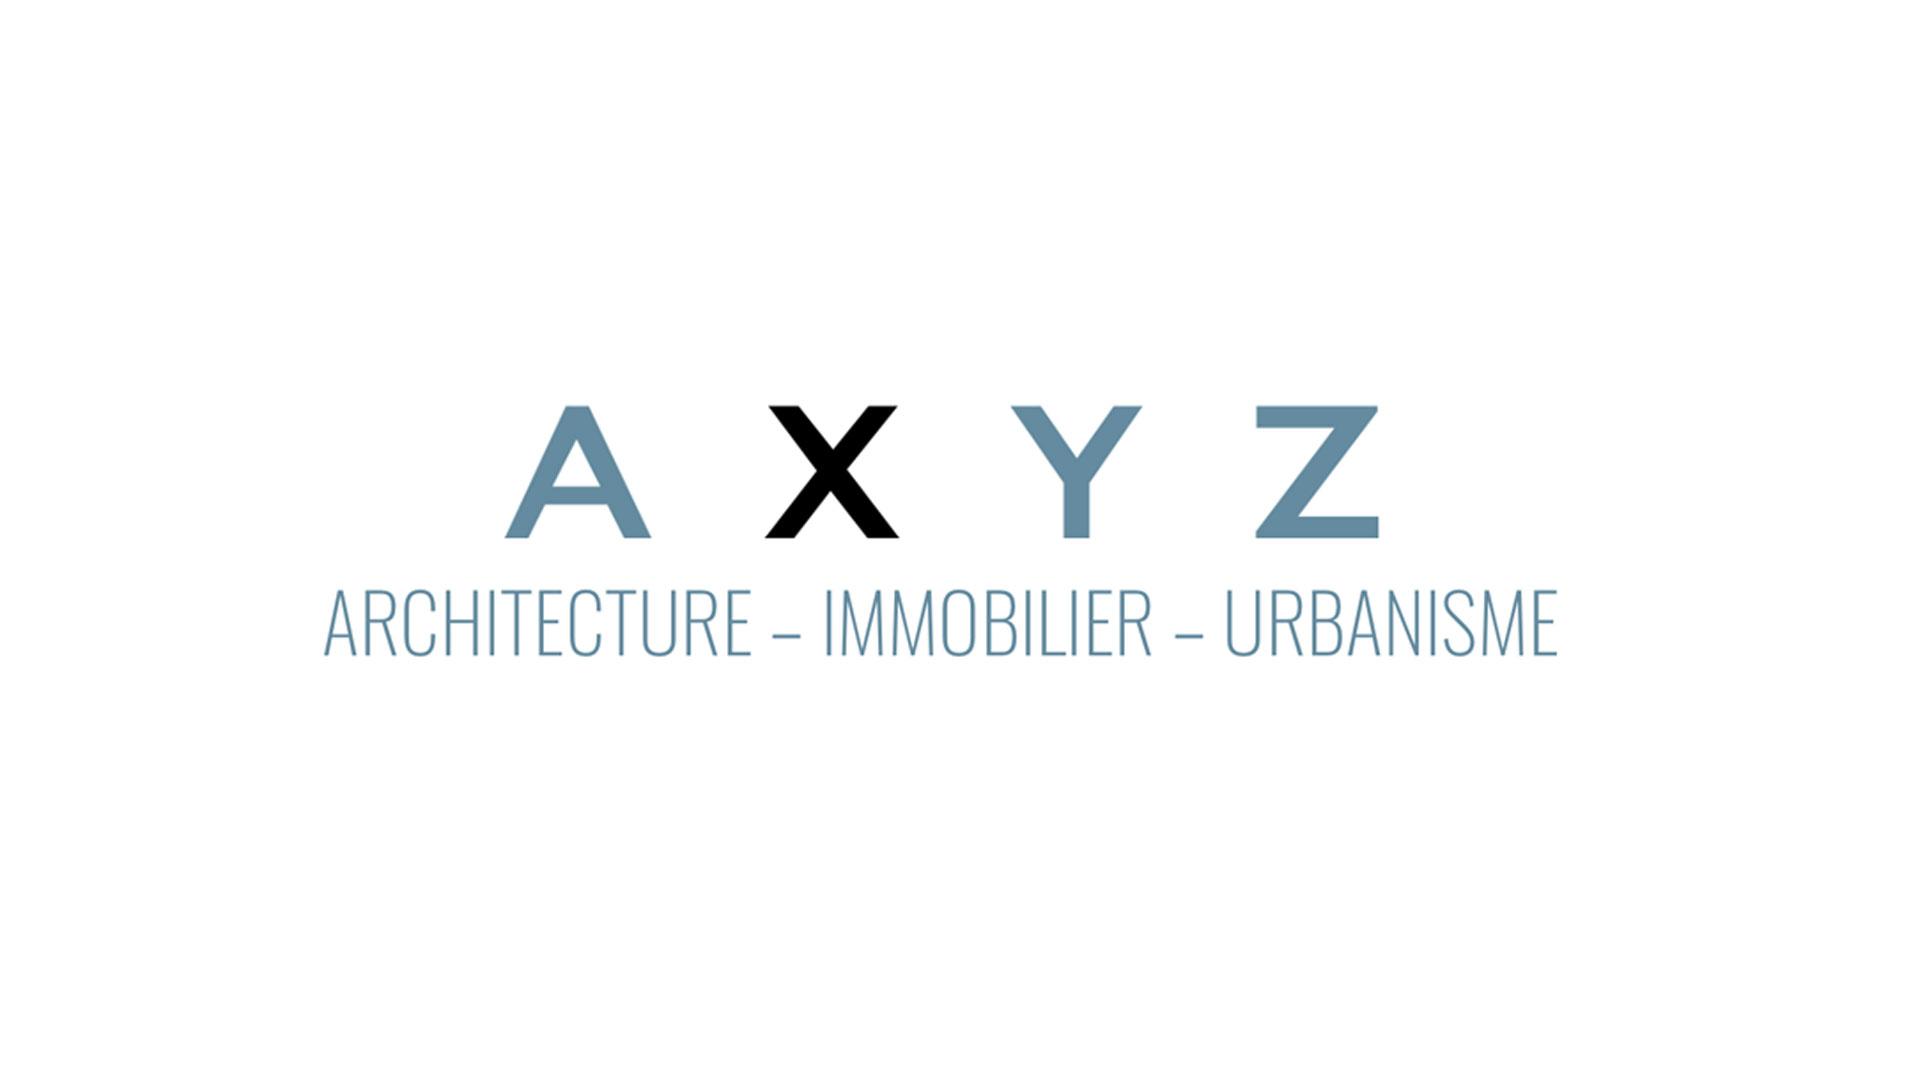 logo AXYZ Arhitecture, Immobiler & Urbanisme